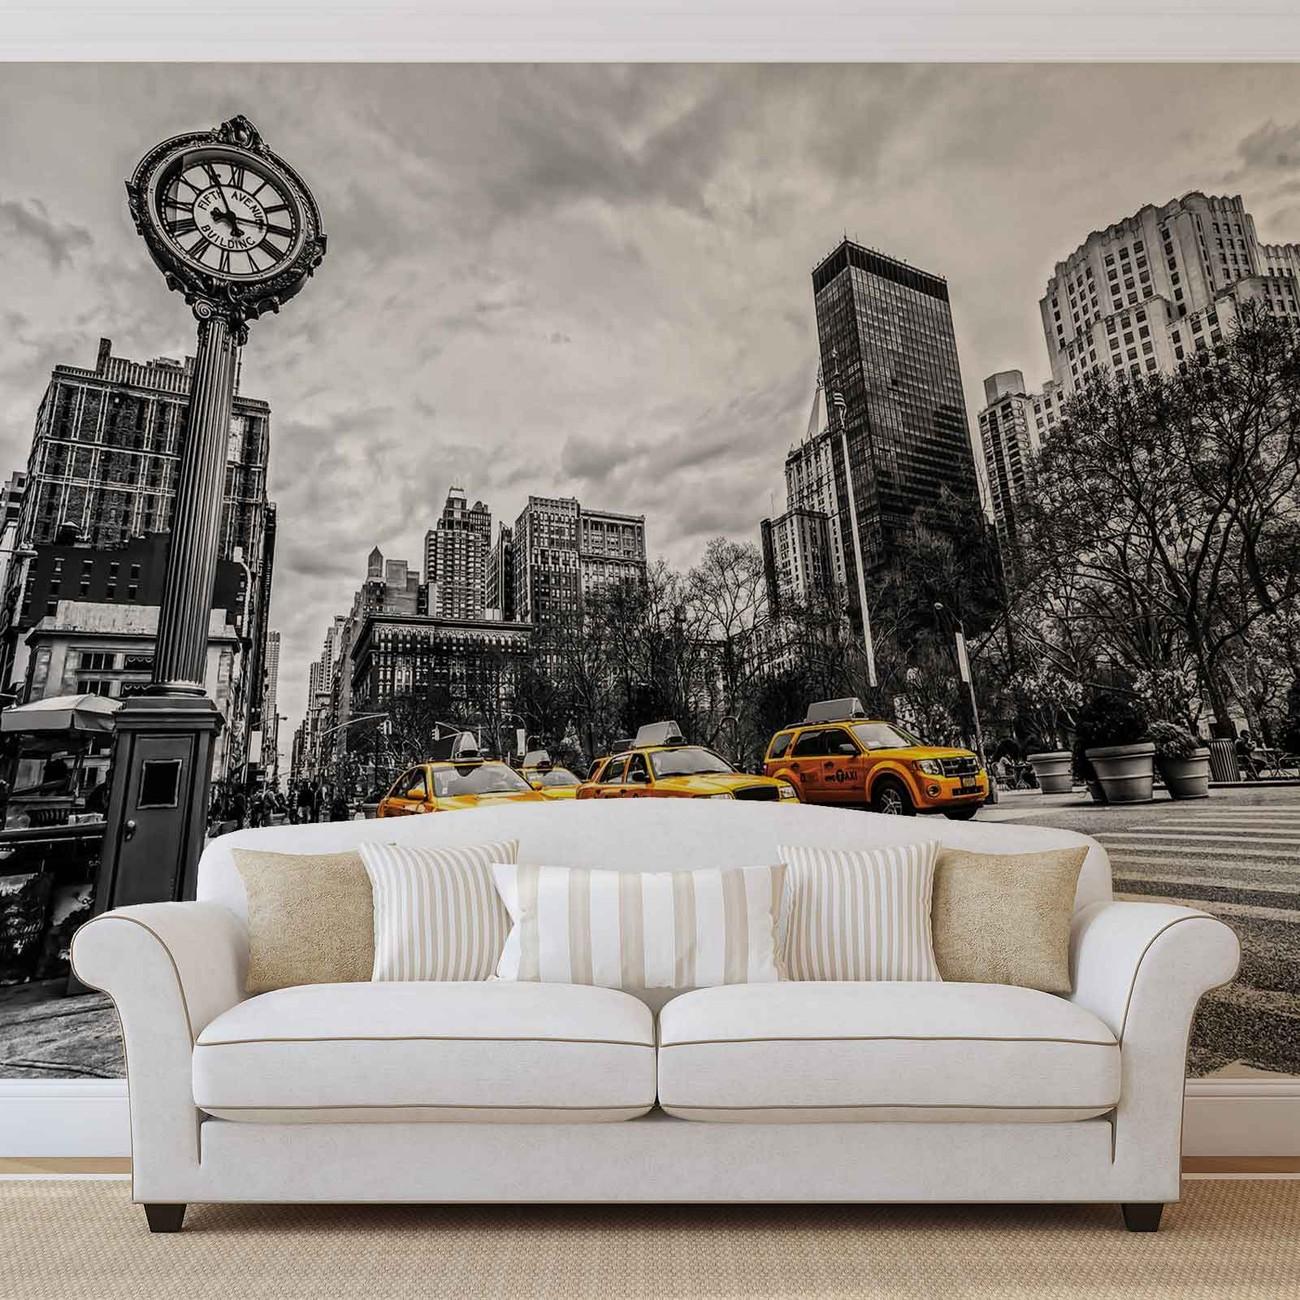 Fotomurale nueva york cabs mural de papel pintado - Papel pintado nueva york ...